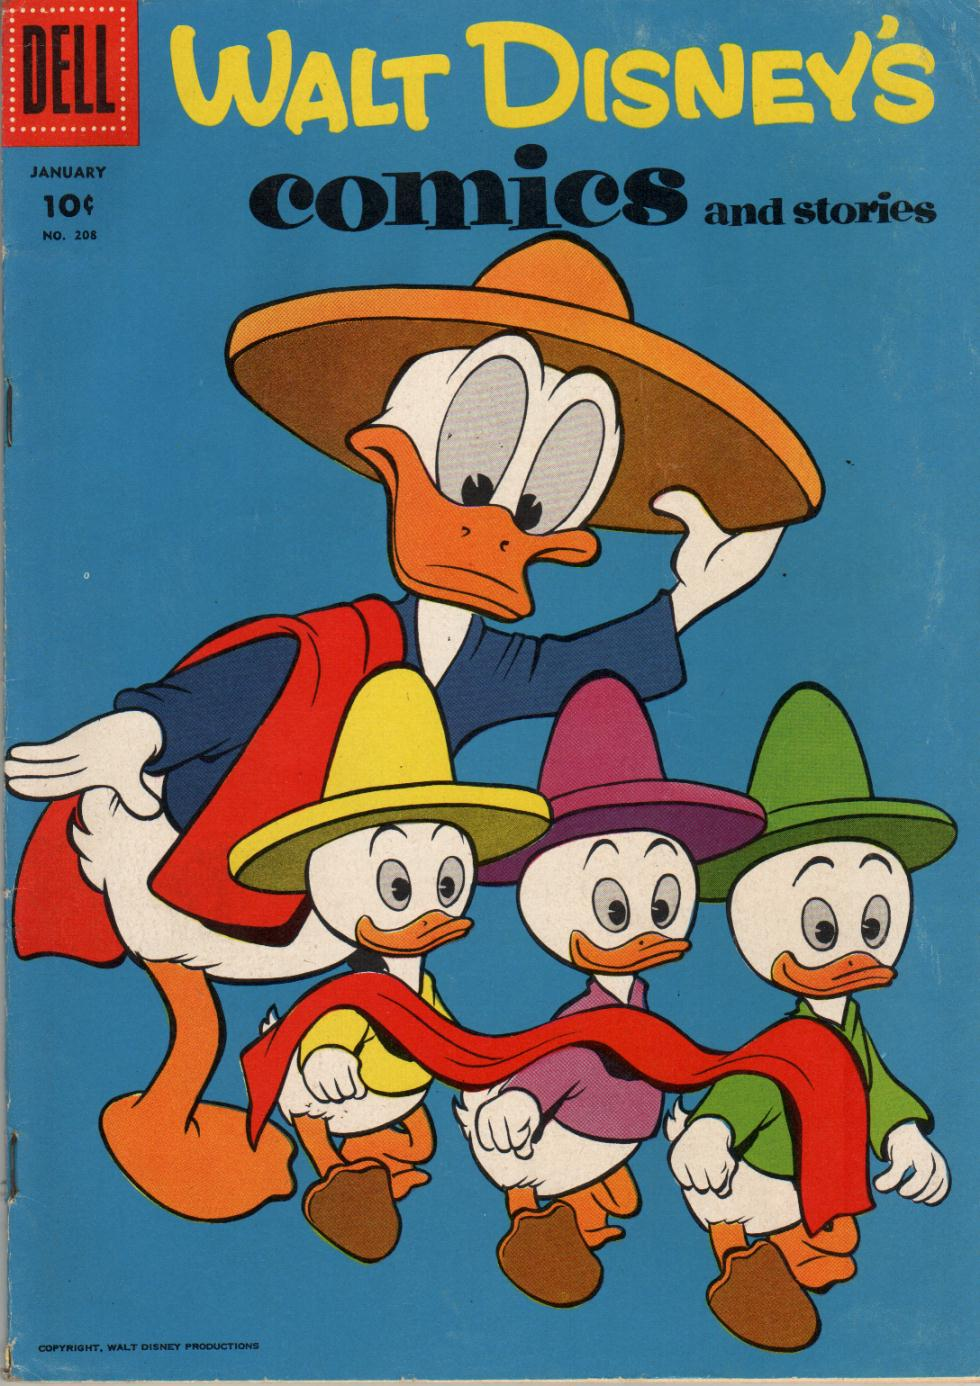 Walt Disneys Comics and Stories 208 Page 1